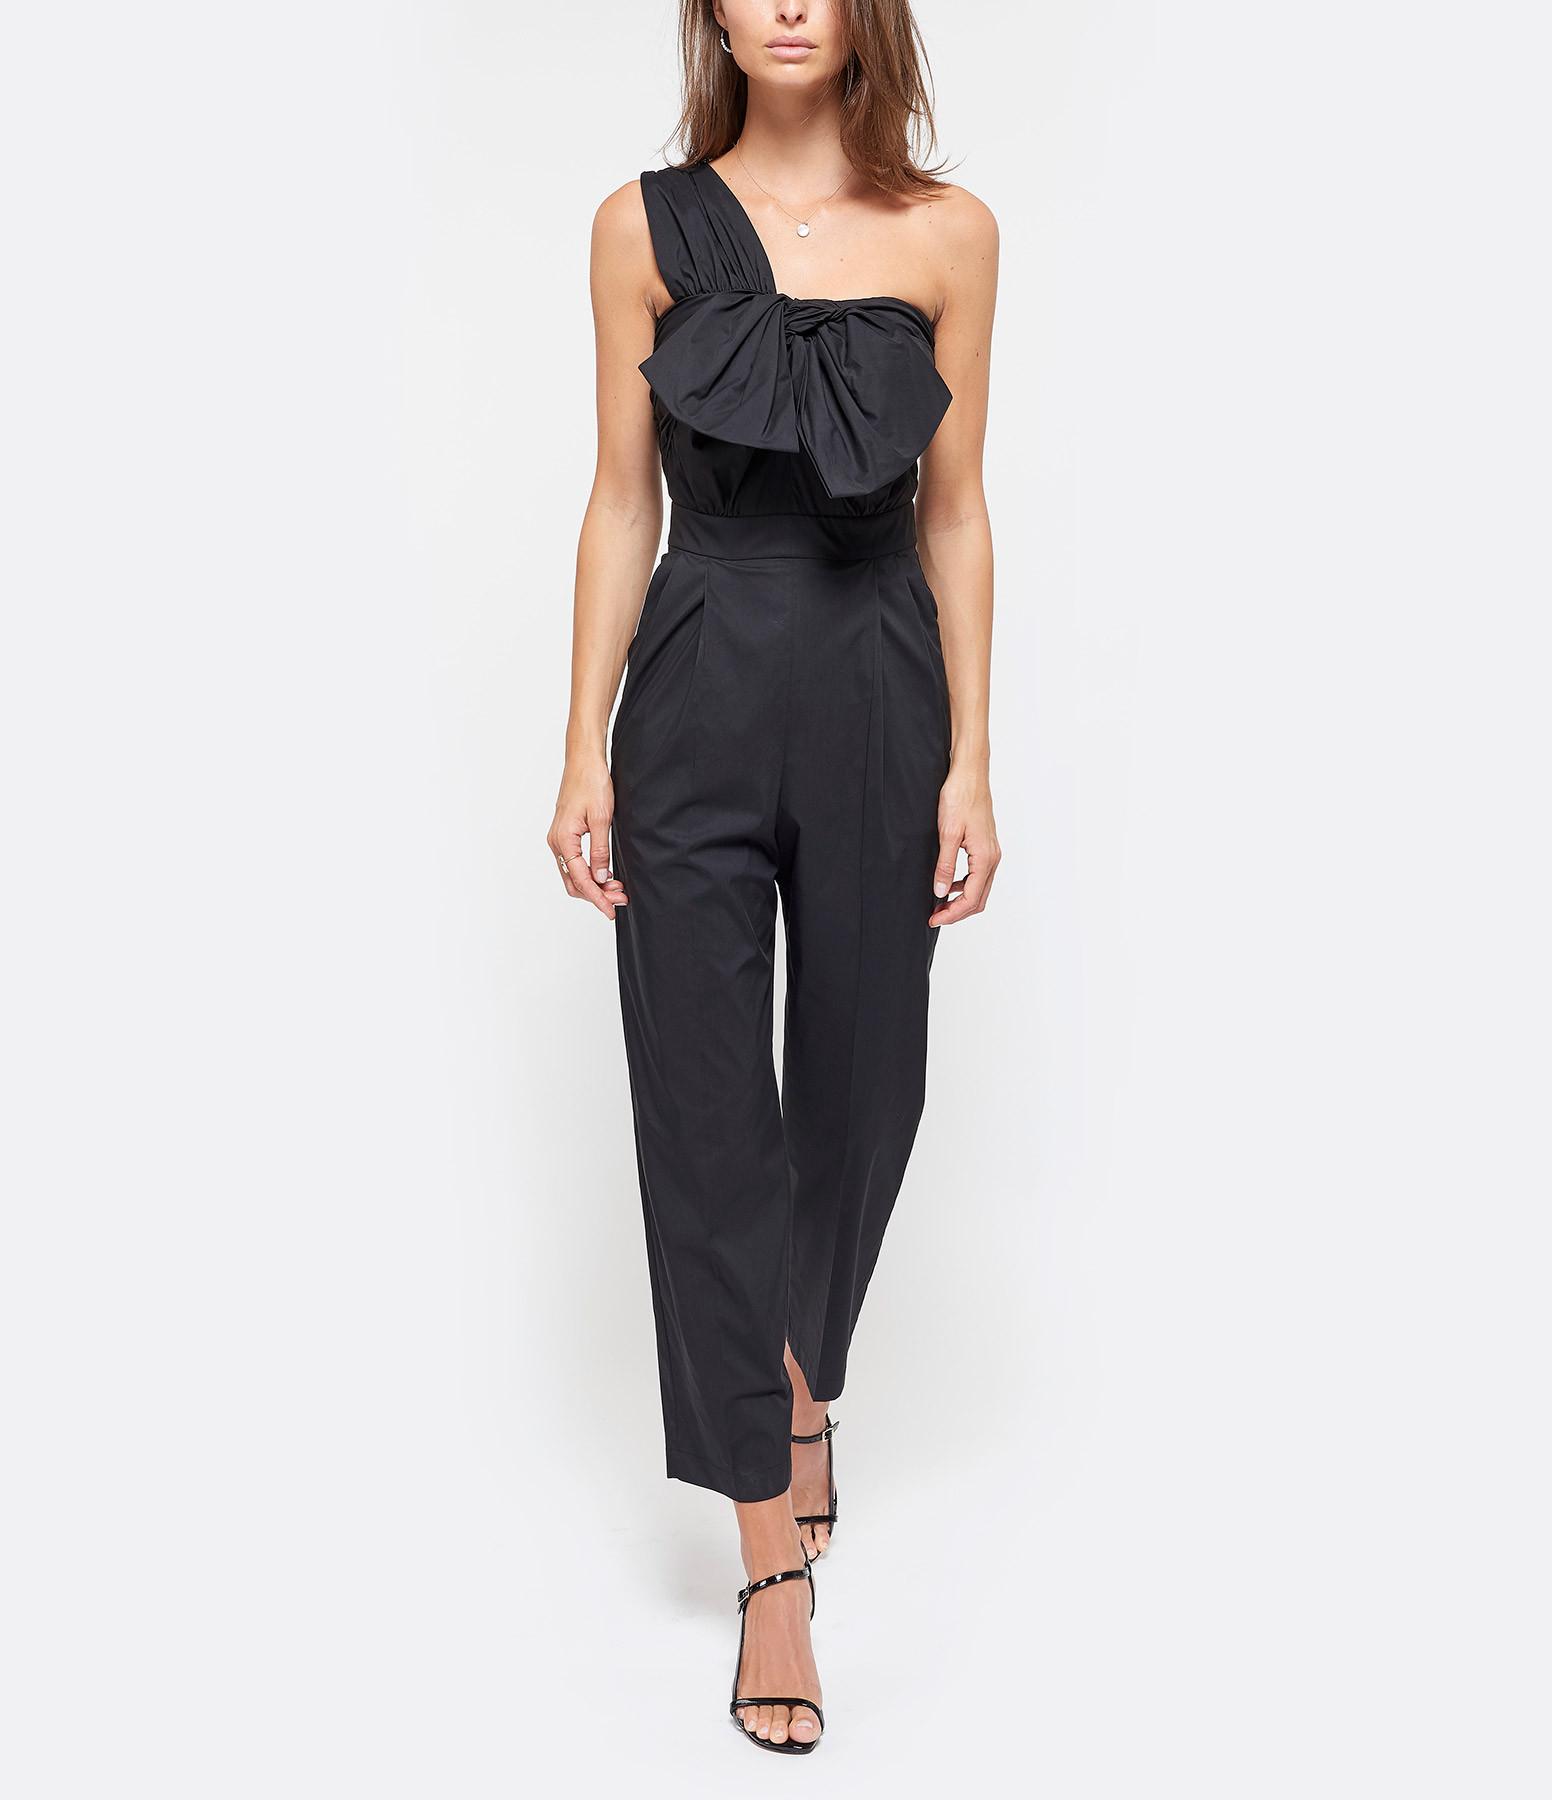 MSGM - Combinaison Pantalon Noir